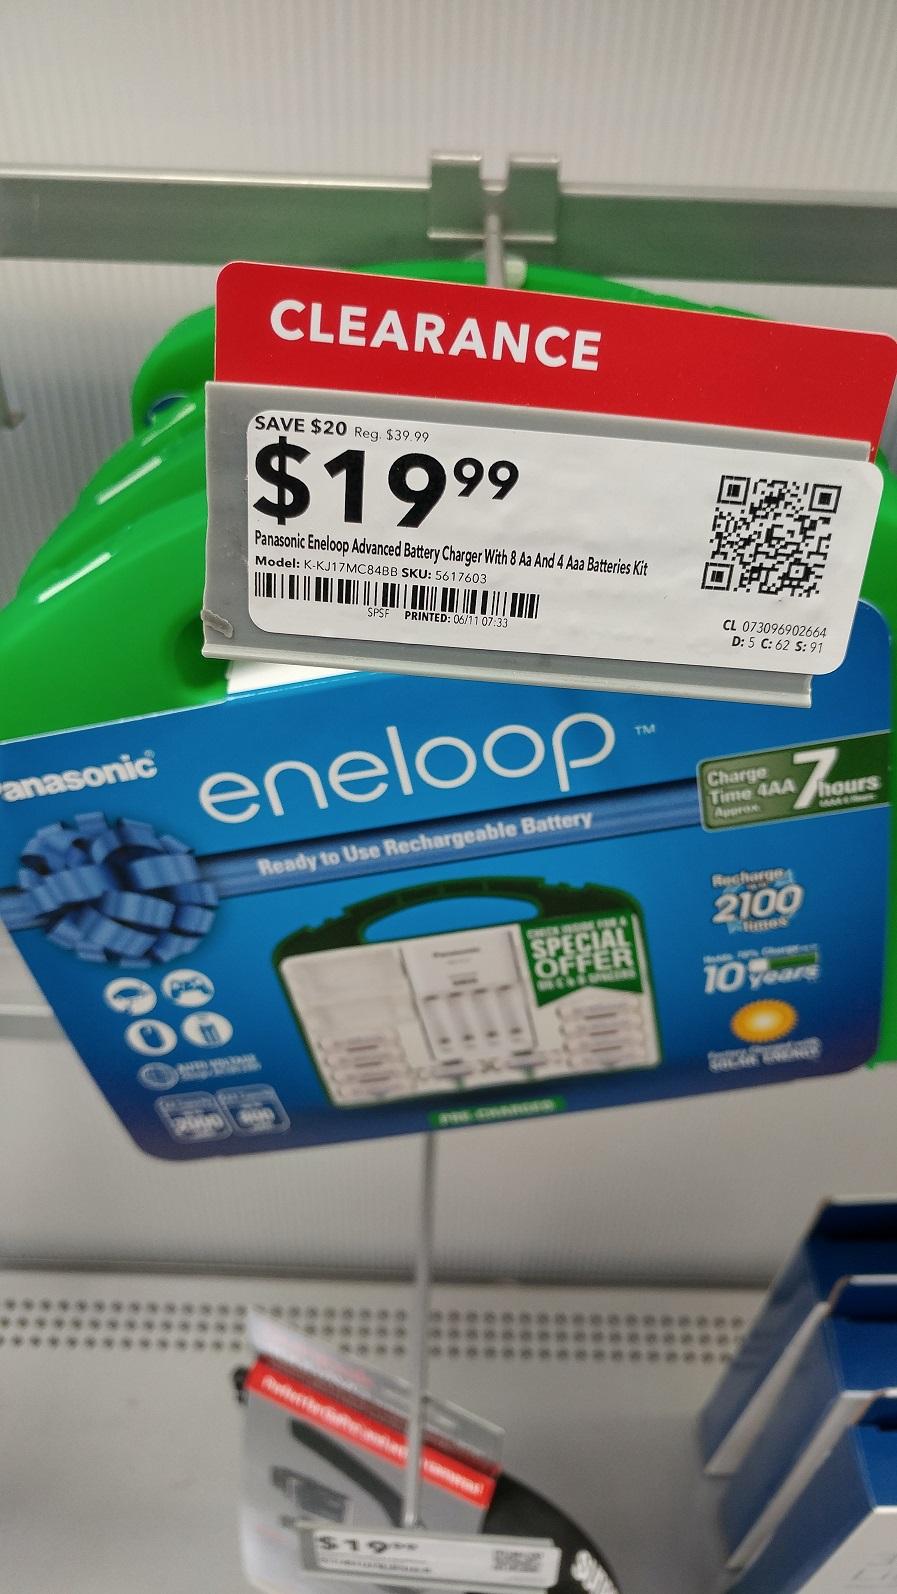 Panasonic eneloop kit 8aa+4aaa & charger -$20 B&M